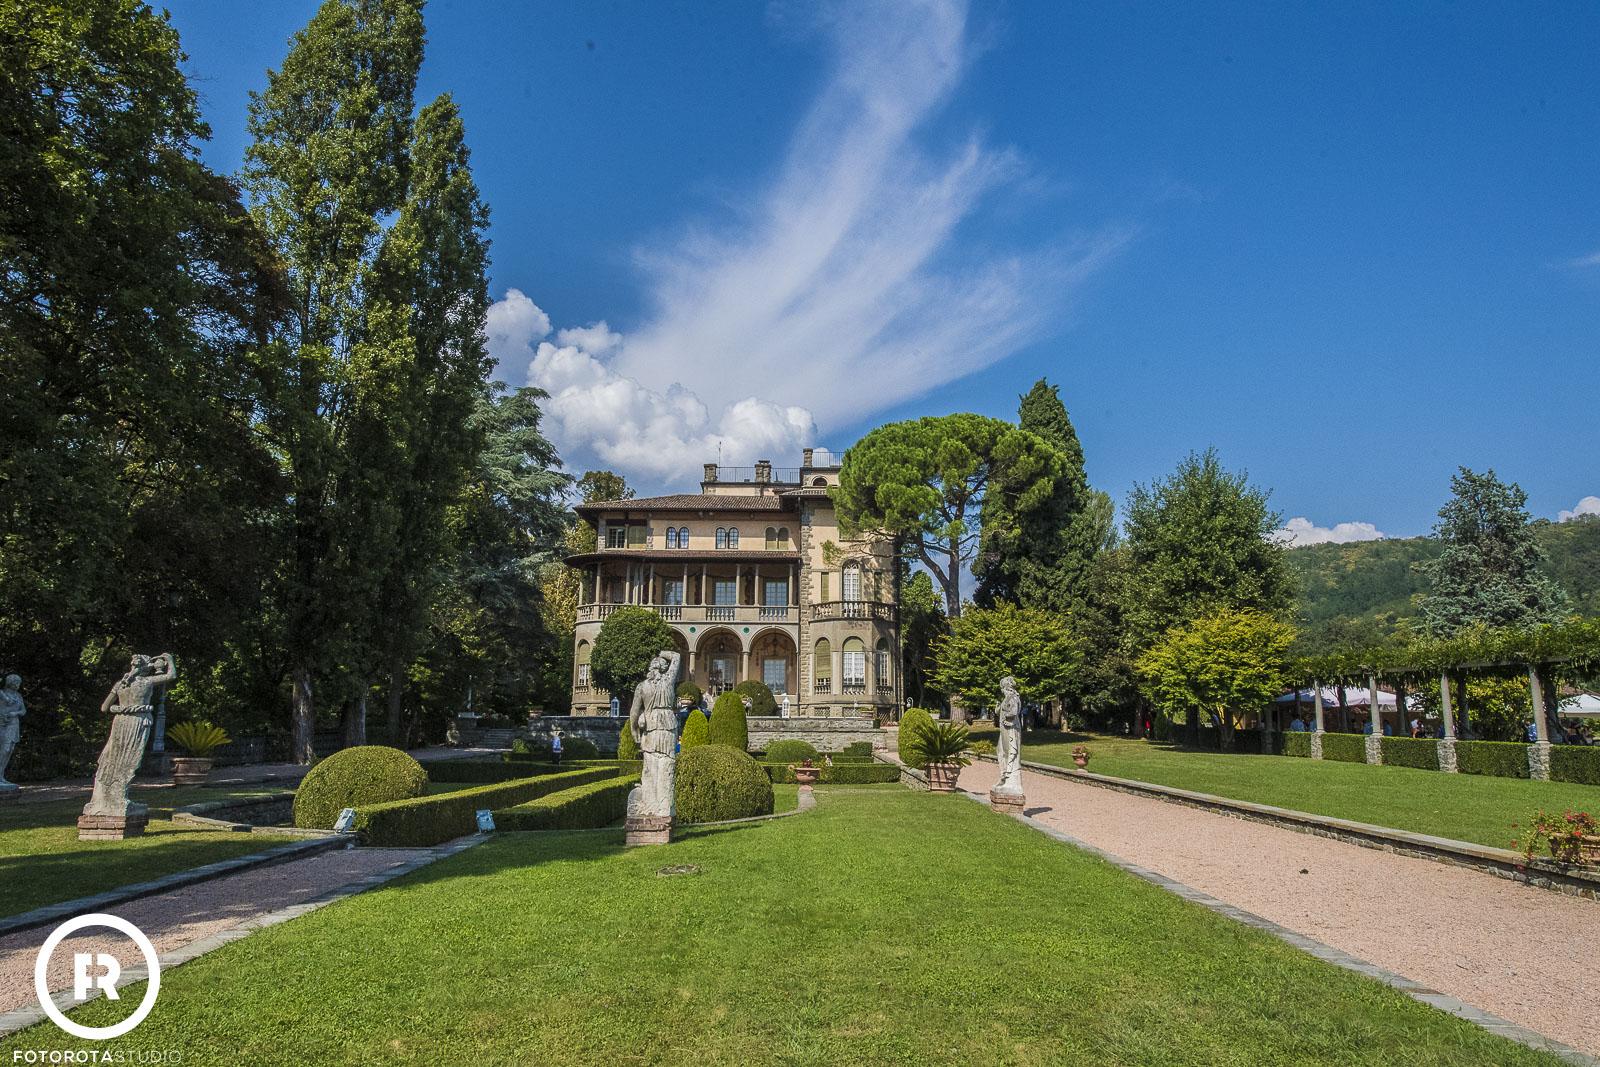 The Italian Villa Gallery Multi Award Winning Wedding: Villa Martinelli Mapello Dimore Del Gusto Luxury Wedding